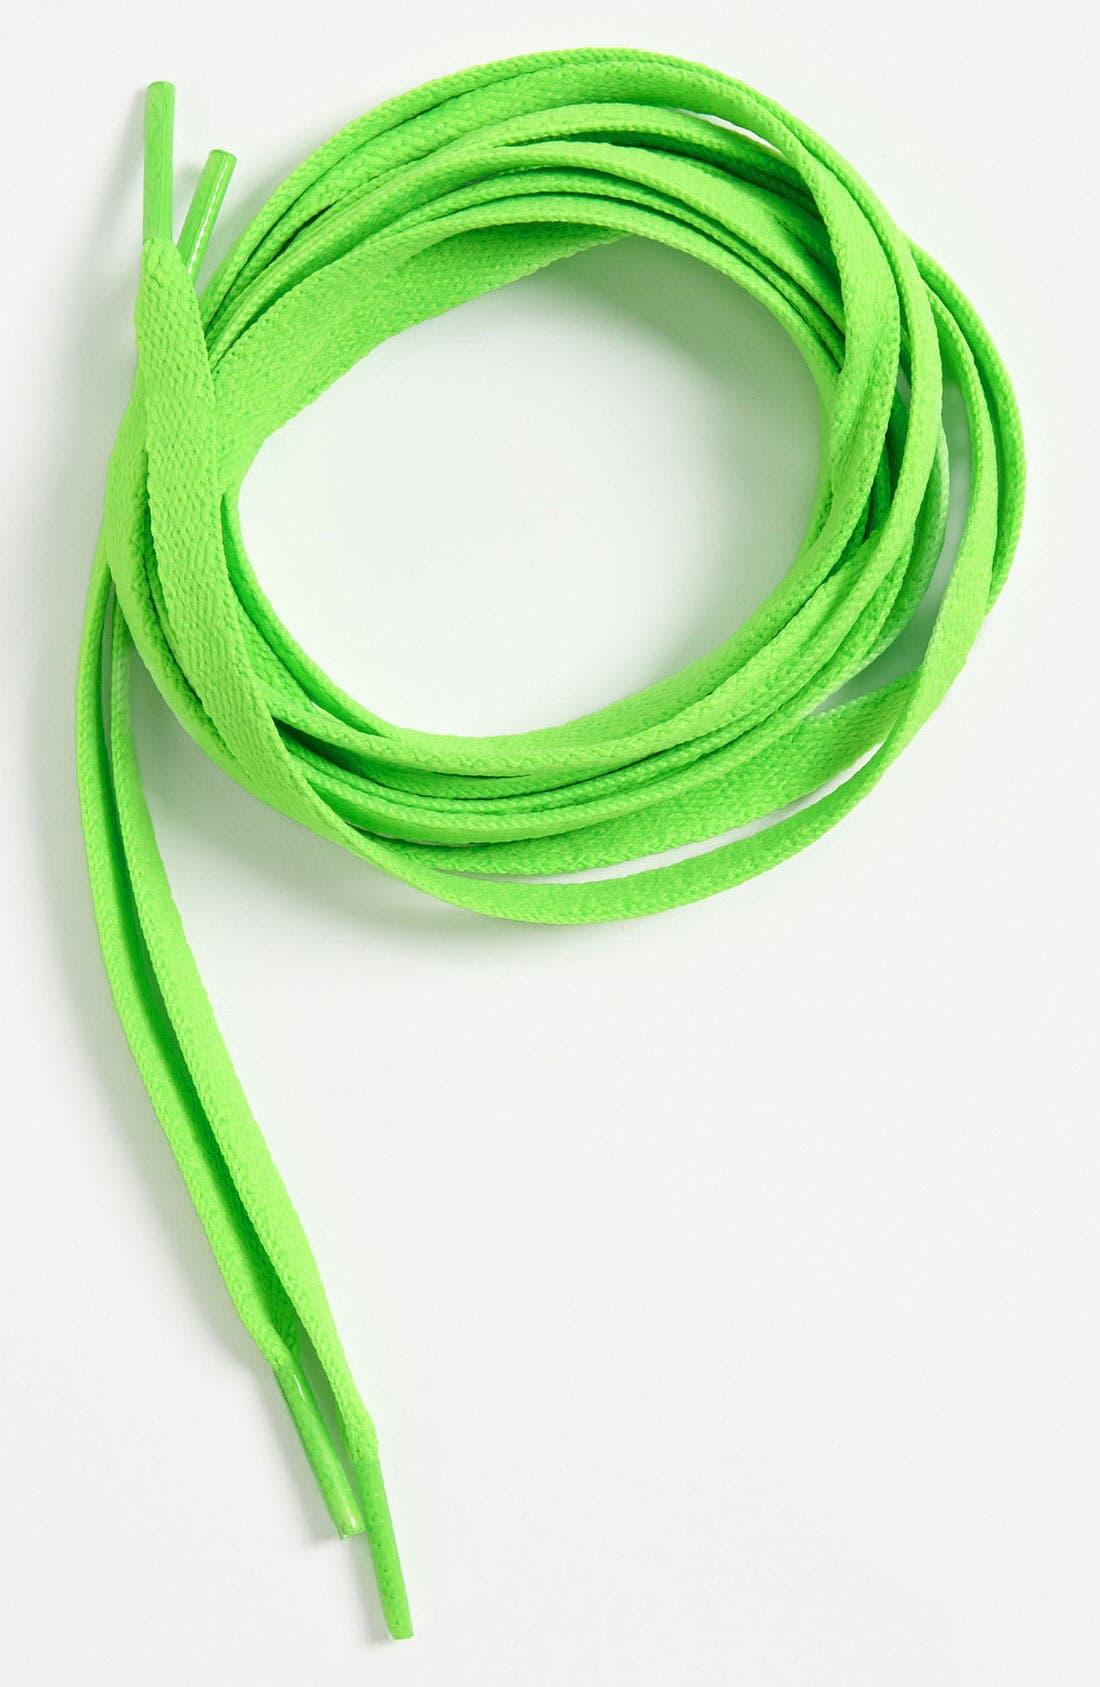 Alternate Image 1 Selected - Nordstrom Flat Shoelaces (Big Kid)